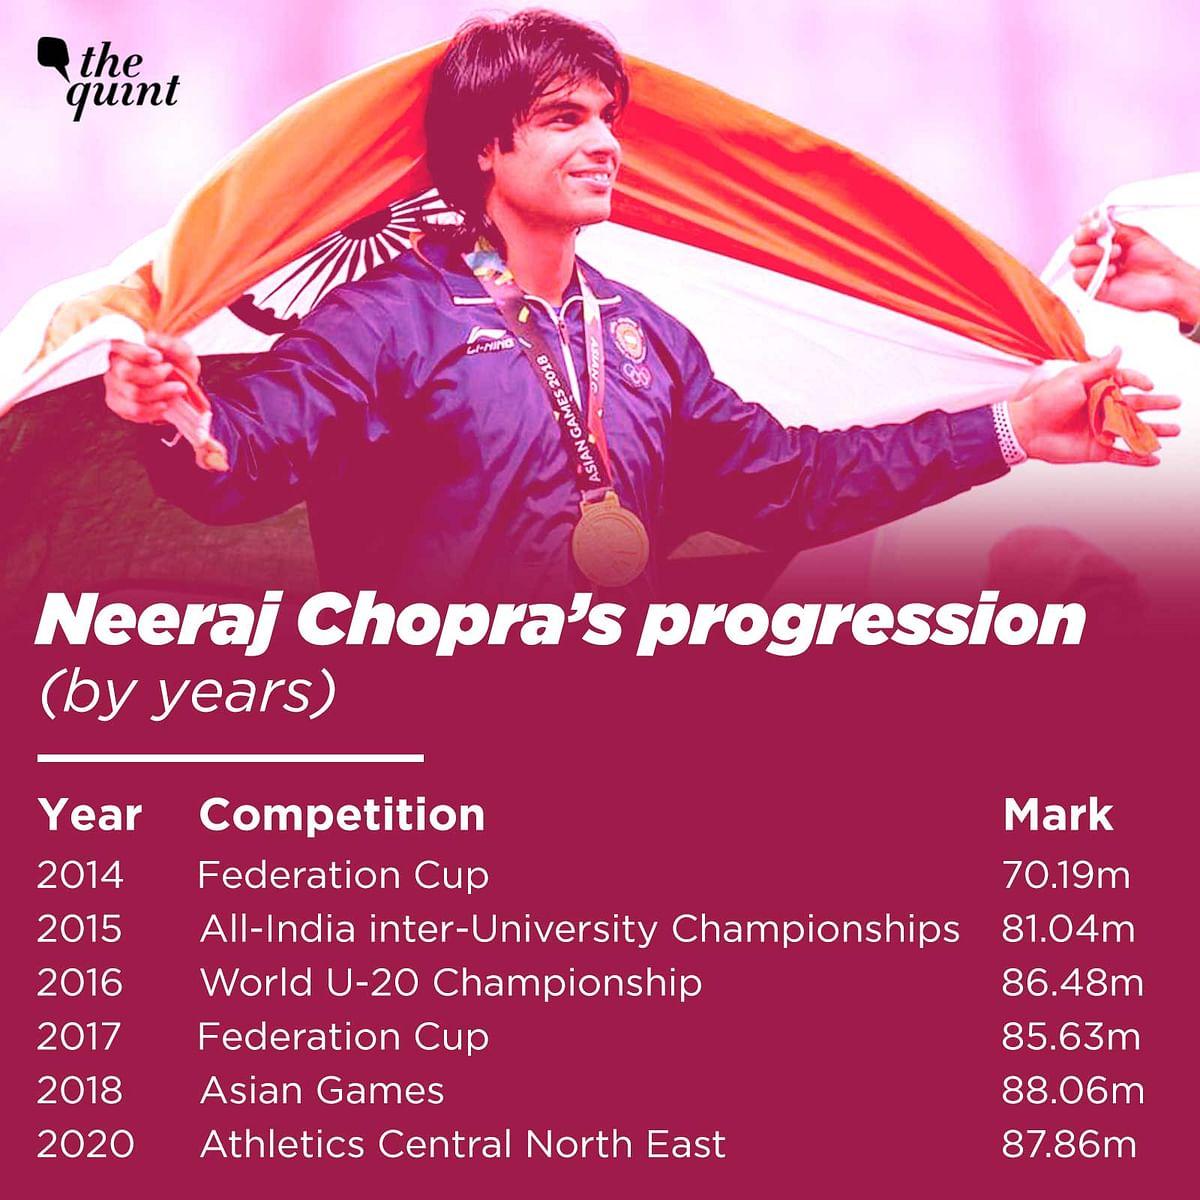 Can Neeraj Chopra's Javelin Land an Olympic Medal at Tokyo 2020?